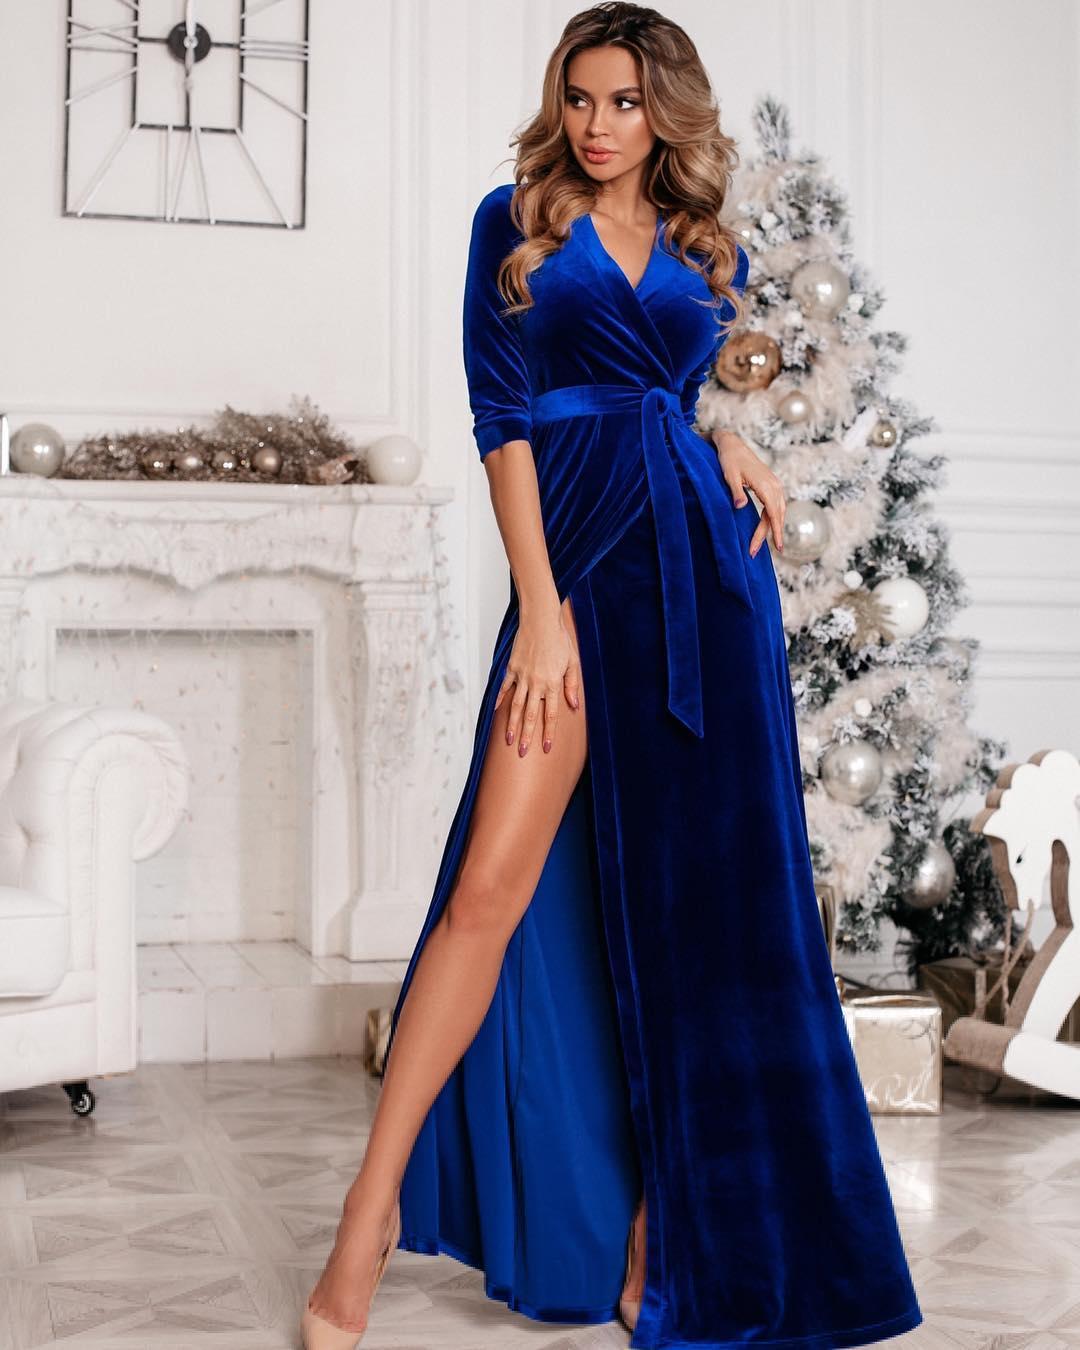 Бархатное платье 2020 фото 5